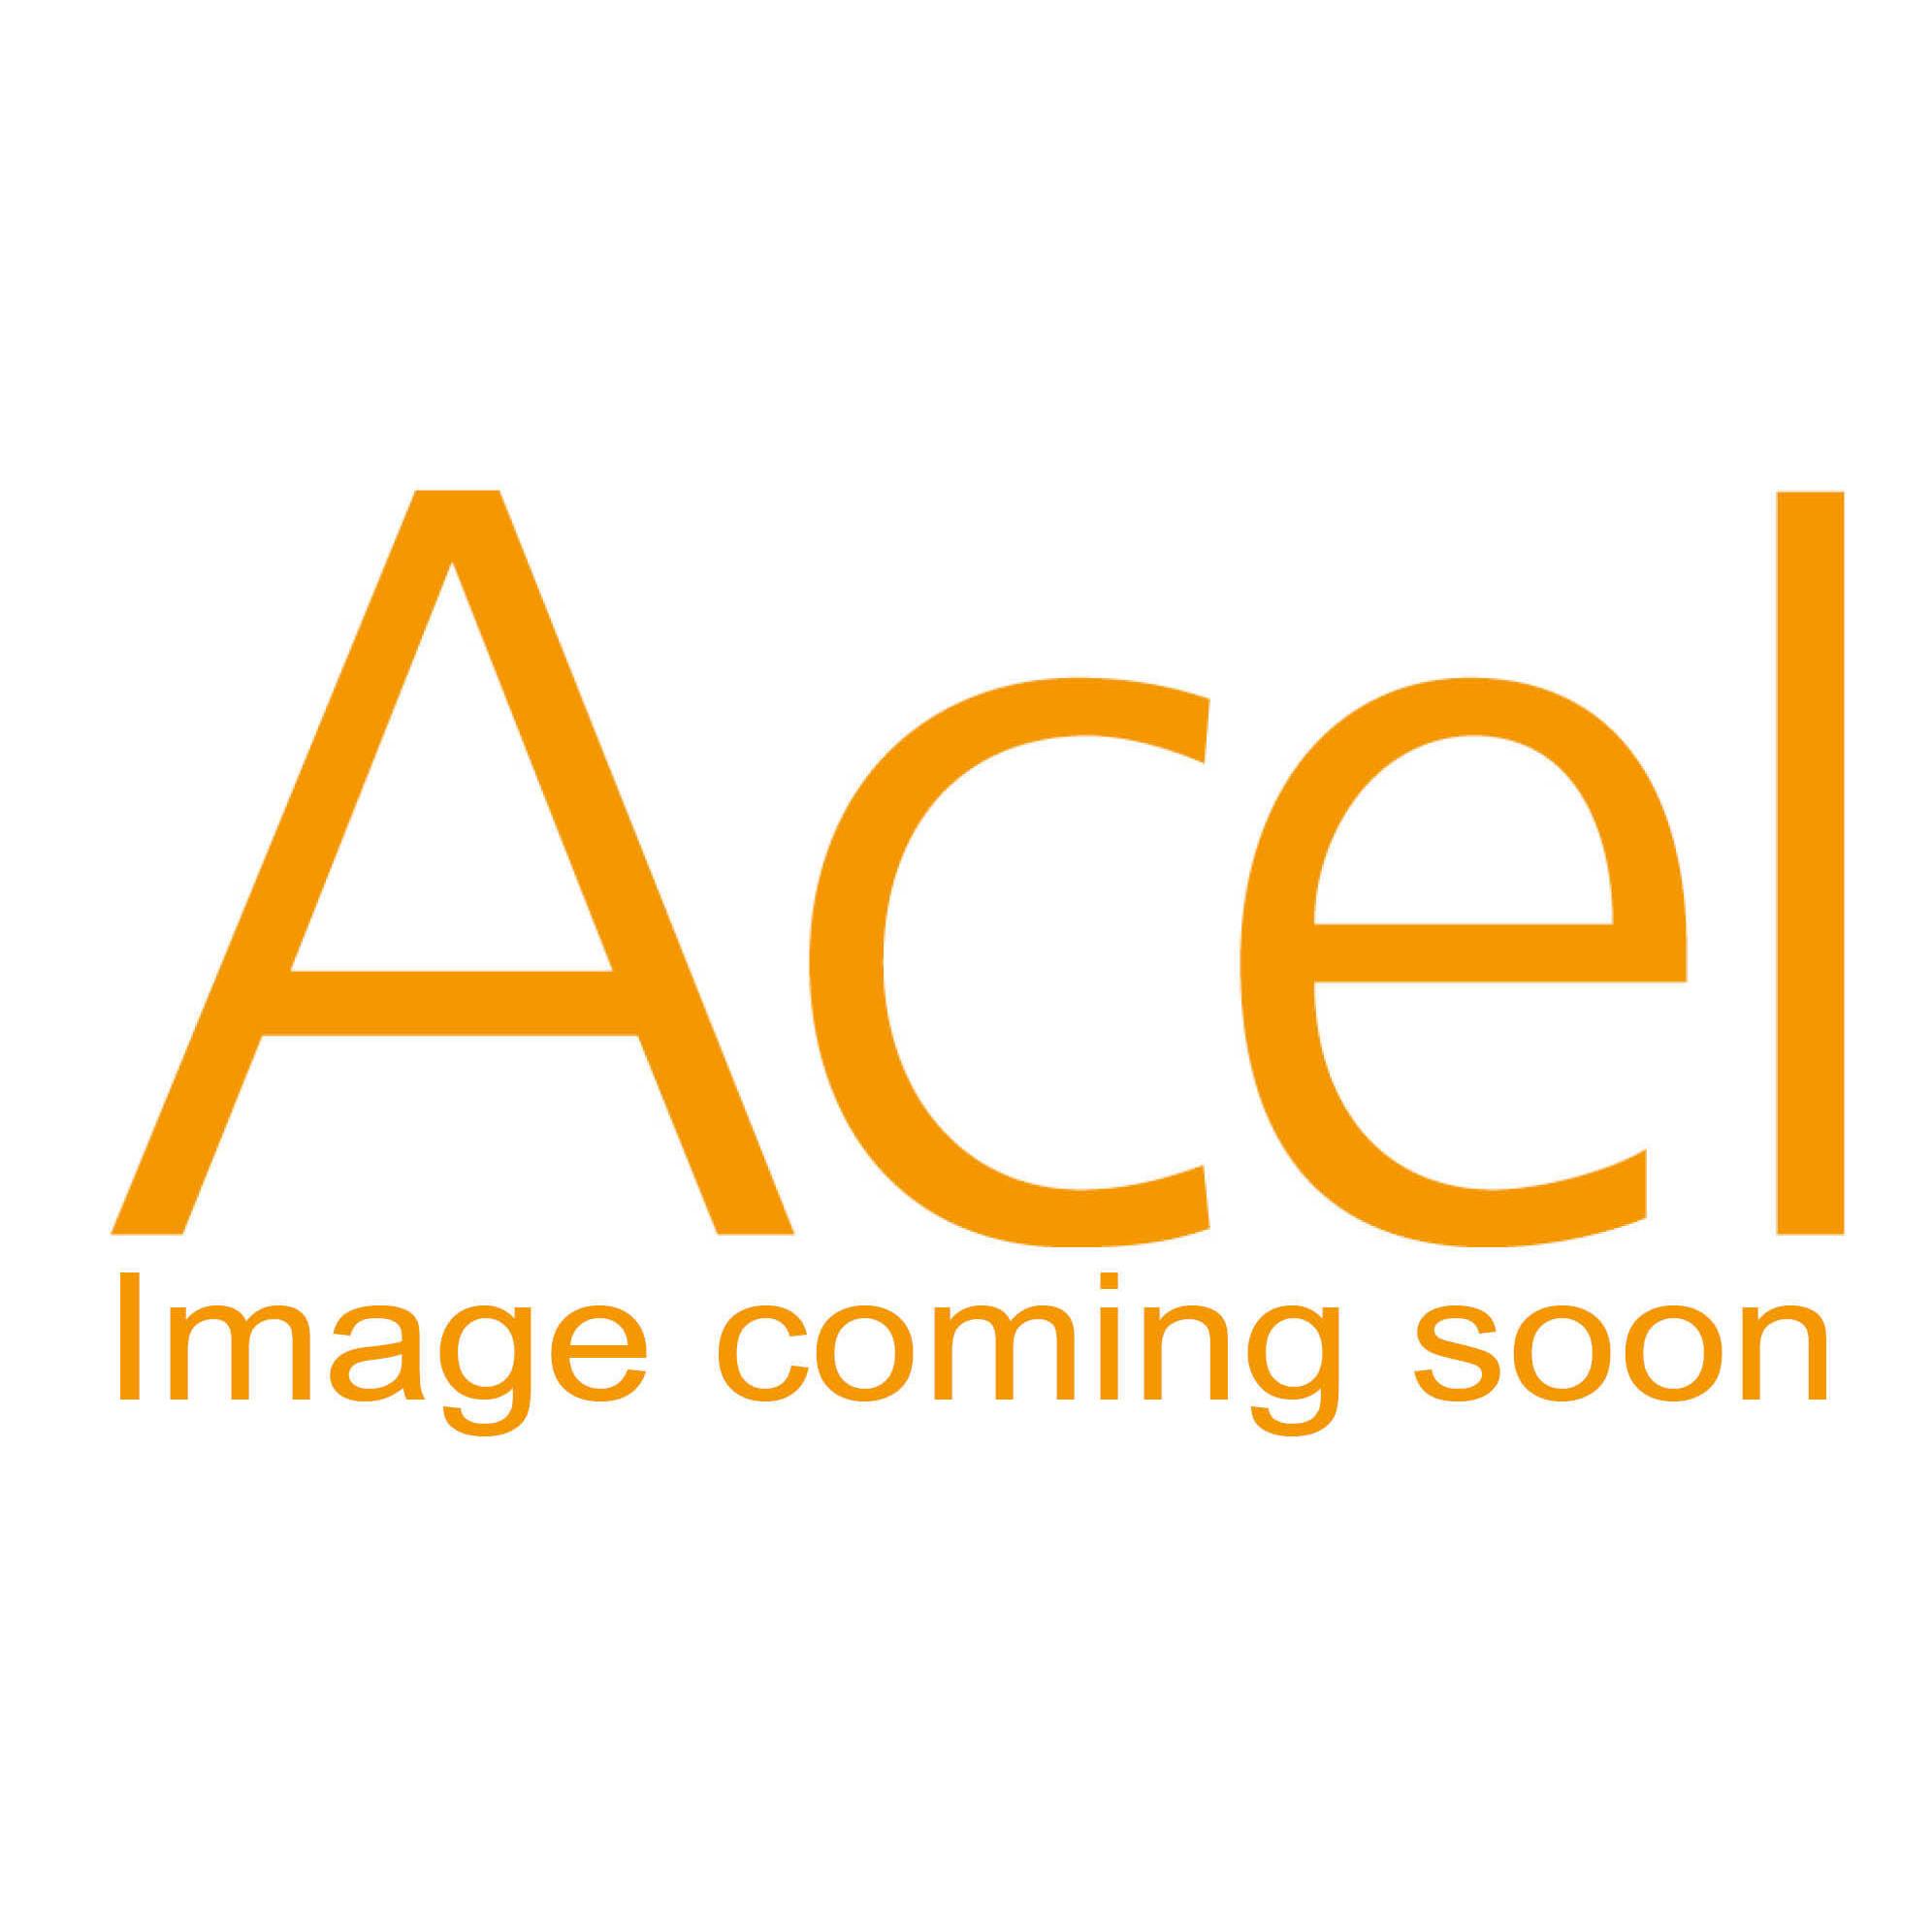 Self Adhesive Vinyl labels - Periodic inspection label - 130 x 60mm Pk10